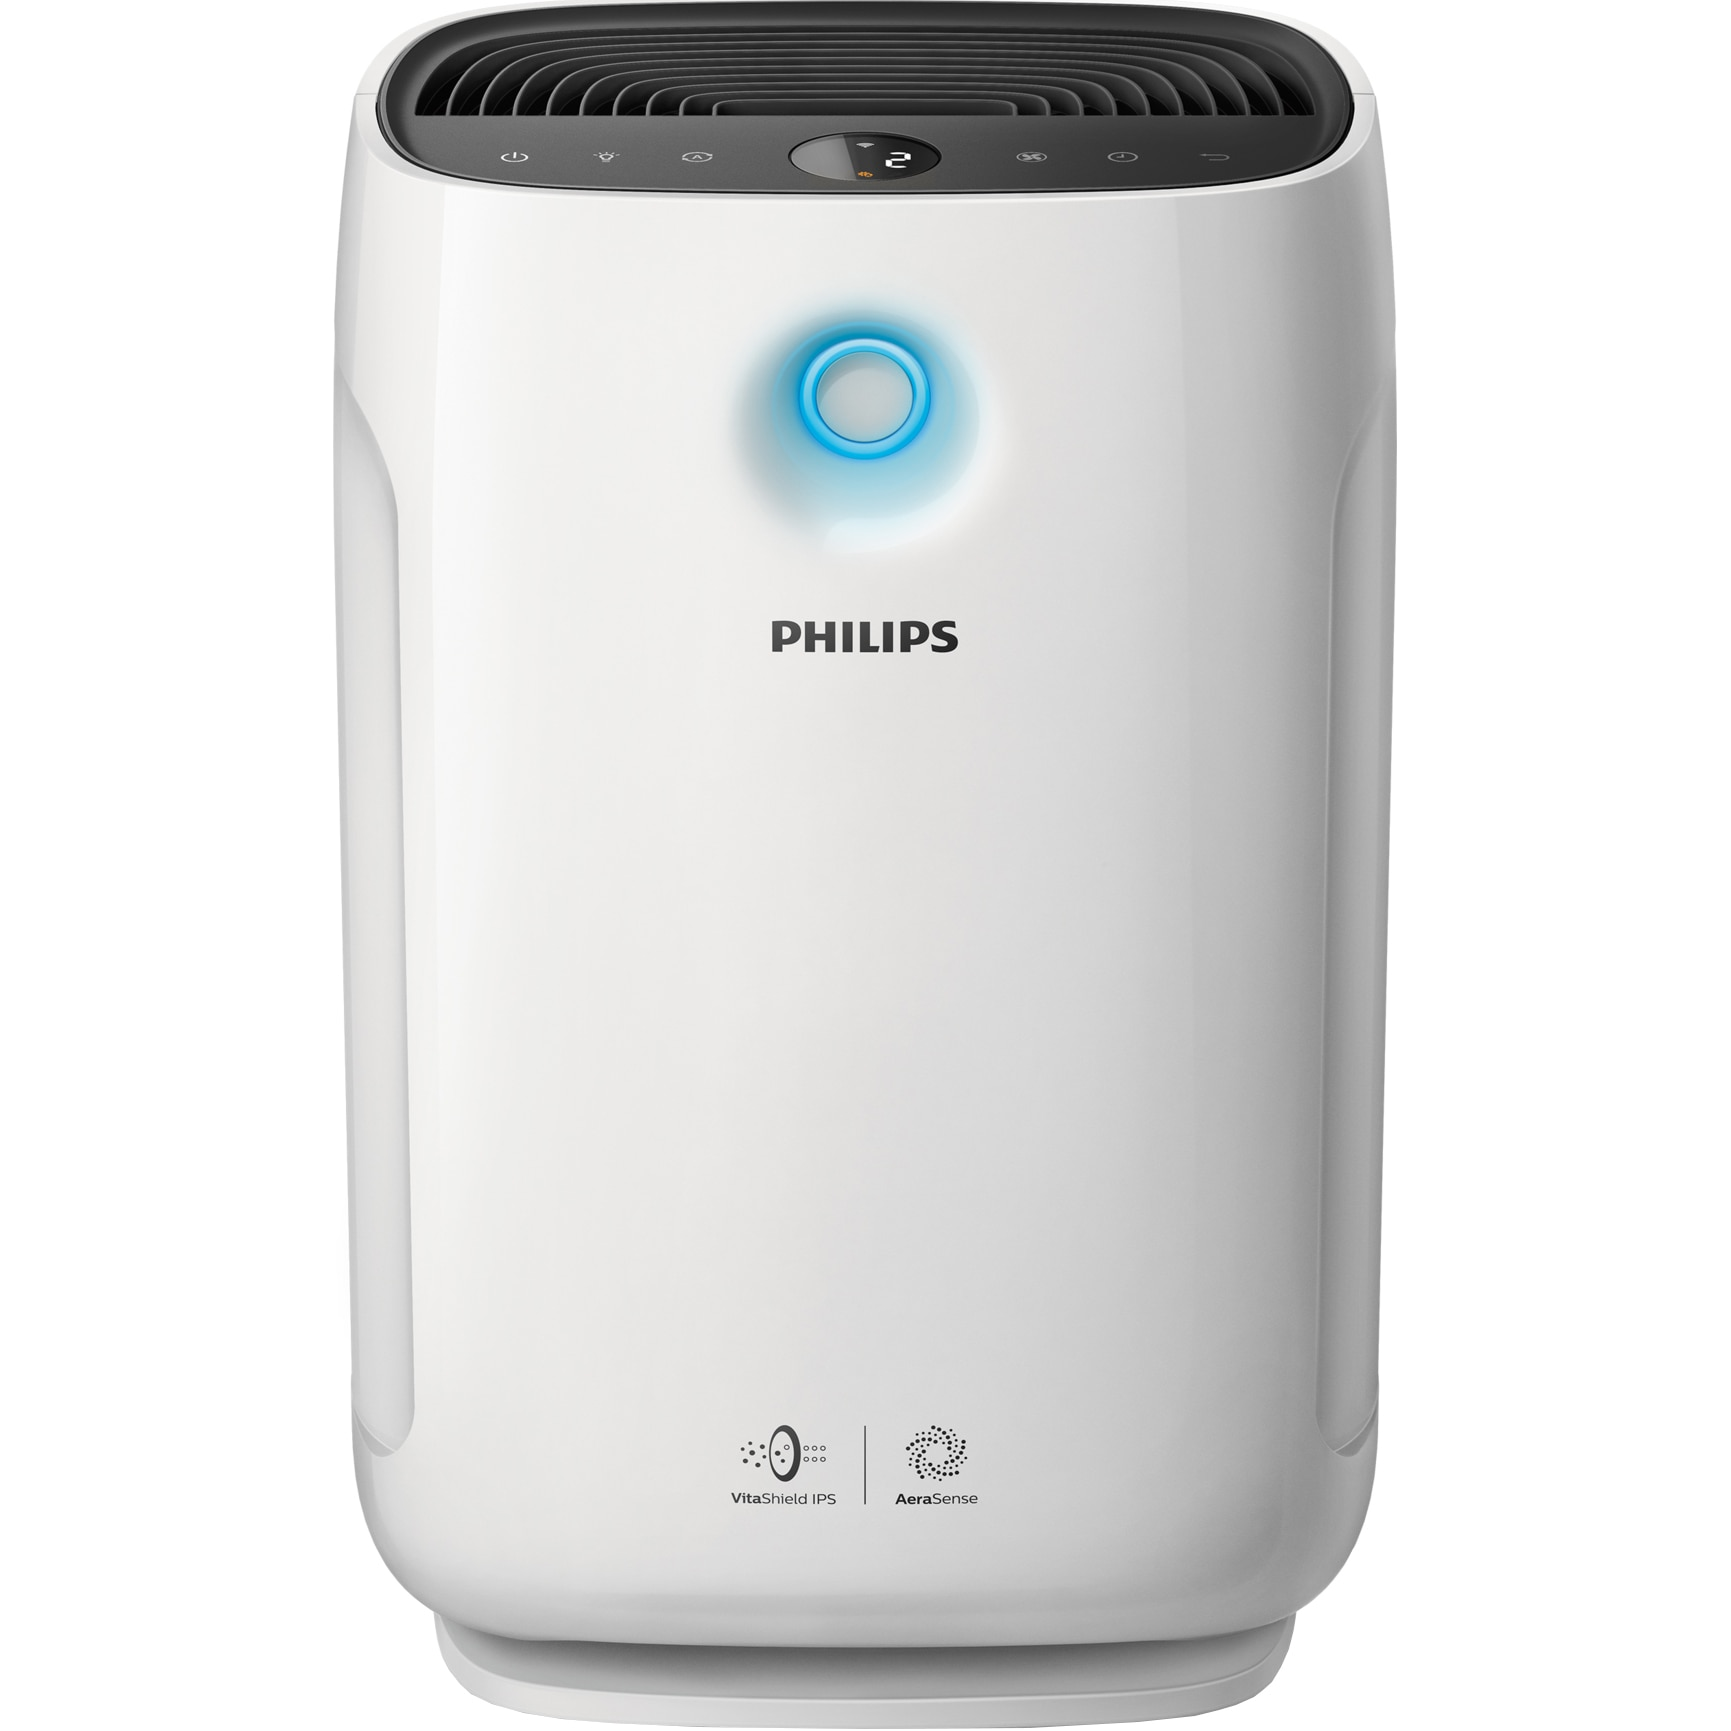 Fotografie Purificator de aer Philips AC2889/10, control aplicatie Air Matters, Tehnologie AeraSense, Tehnologie VitaShield, Feedback real privind calitatea aerului, Conectivitate Bluetooth, 3 moduri automate, diplay numeric, Senzor PM2,5, Alb